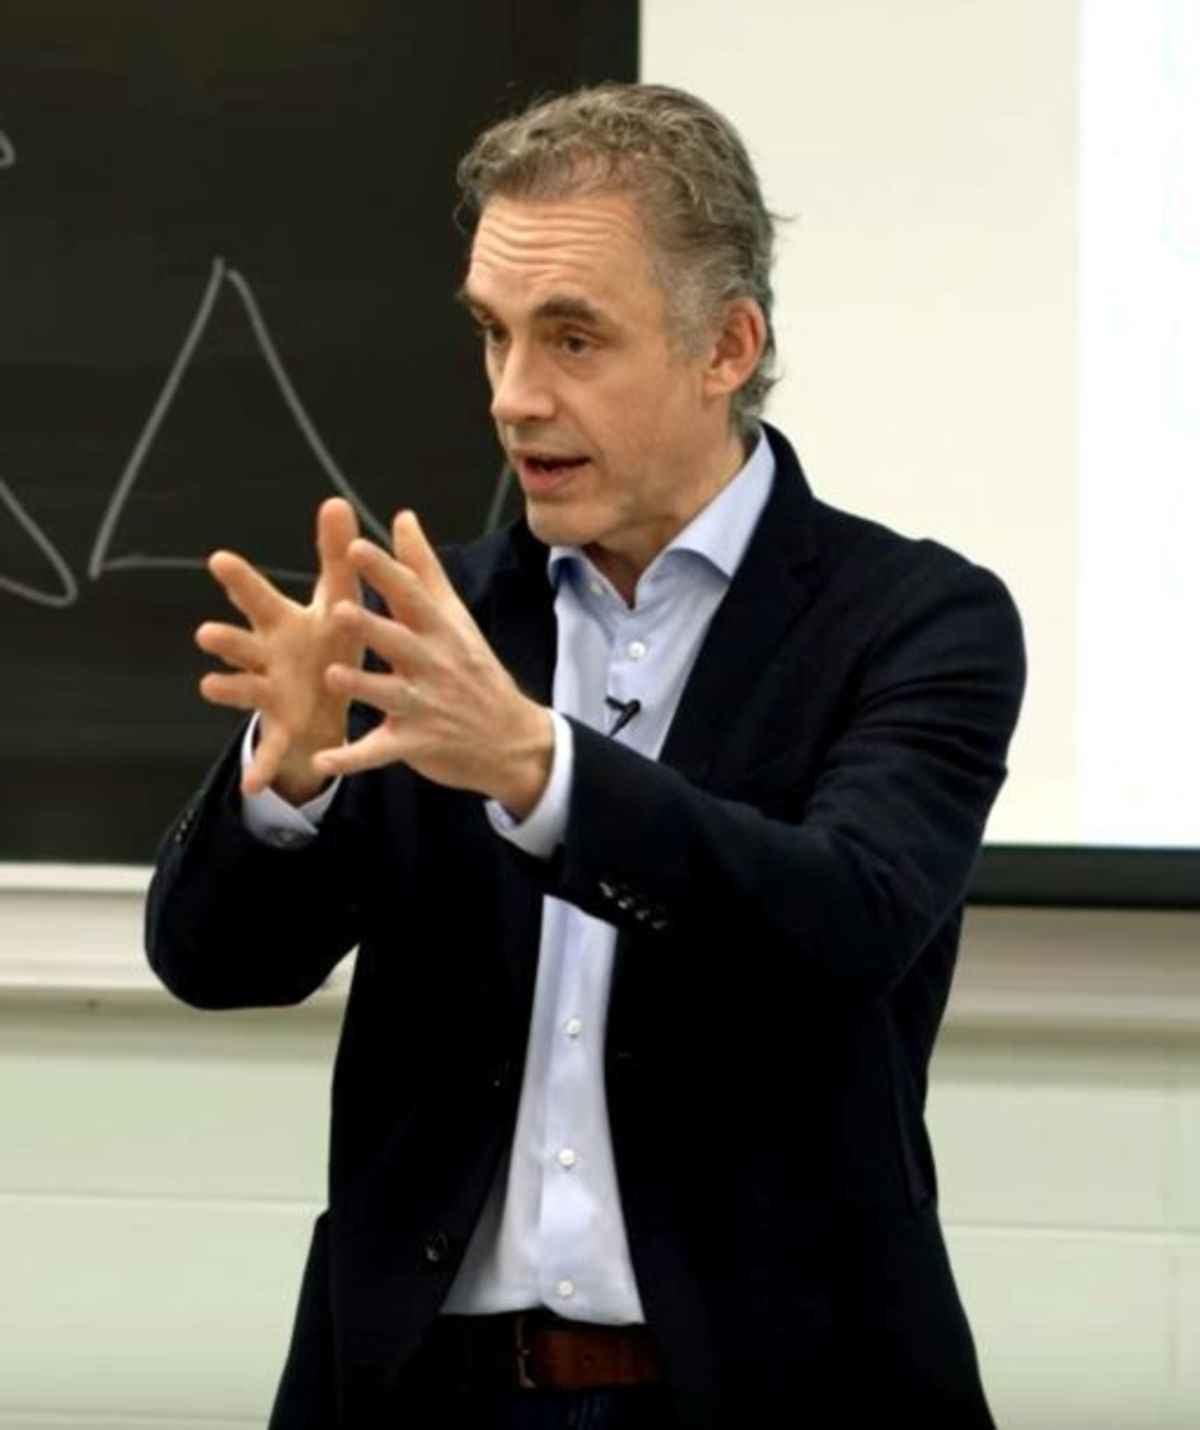 *** Jordan Bernt Peterson (June 12 1962) - Canadian clinical psychologist and public intellectual professor of psychology the University of Toronto ***